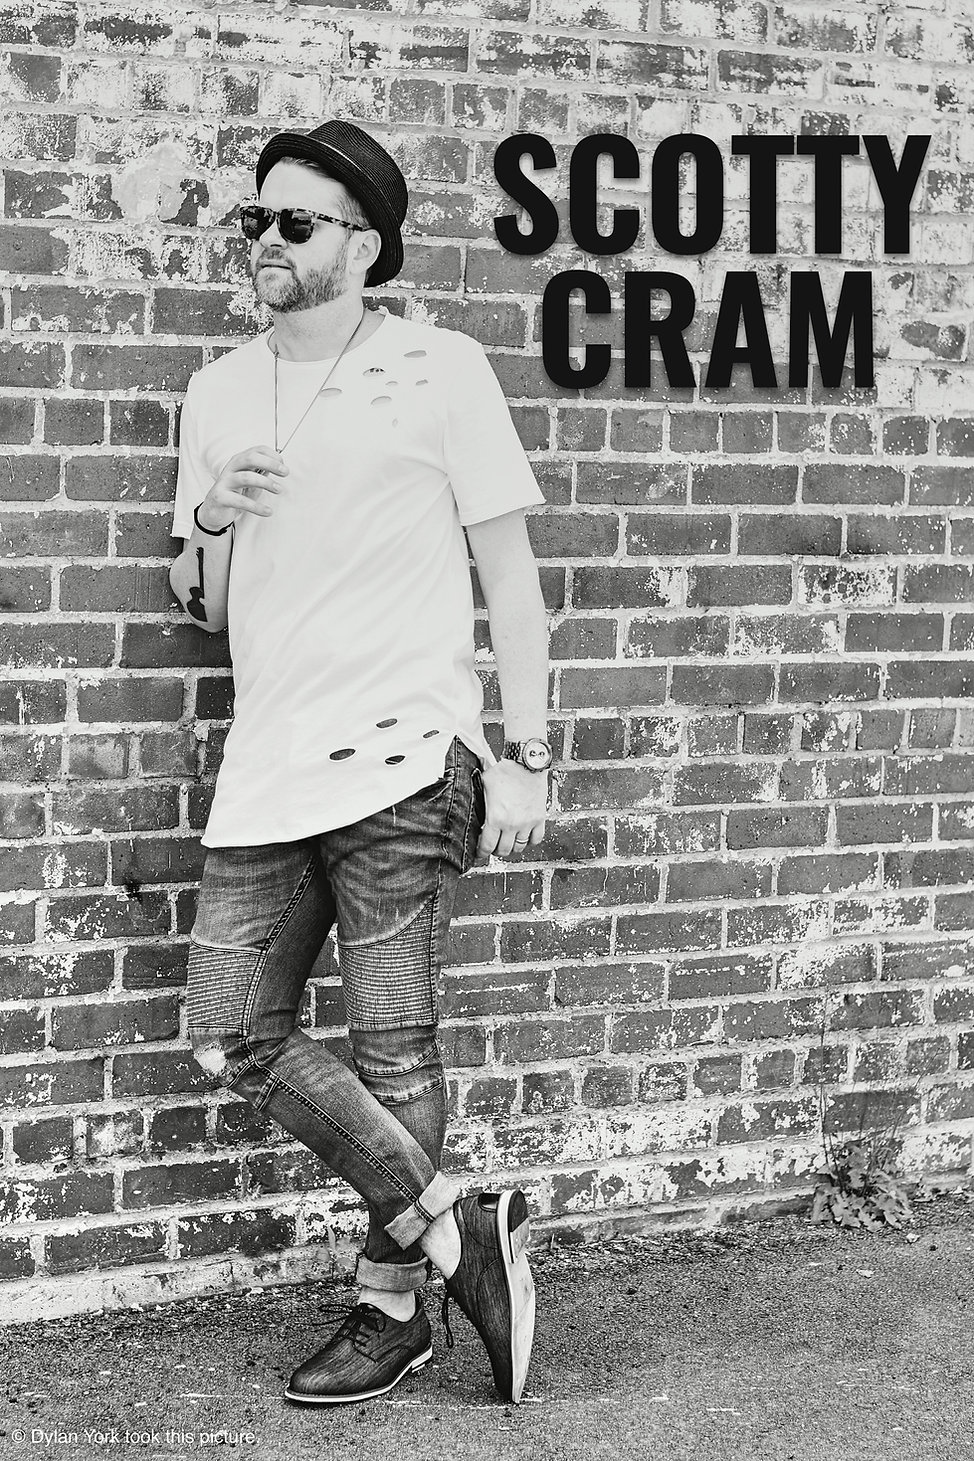 Scotty Cram